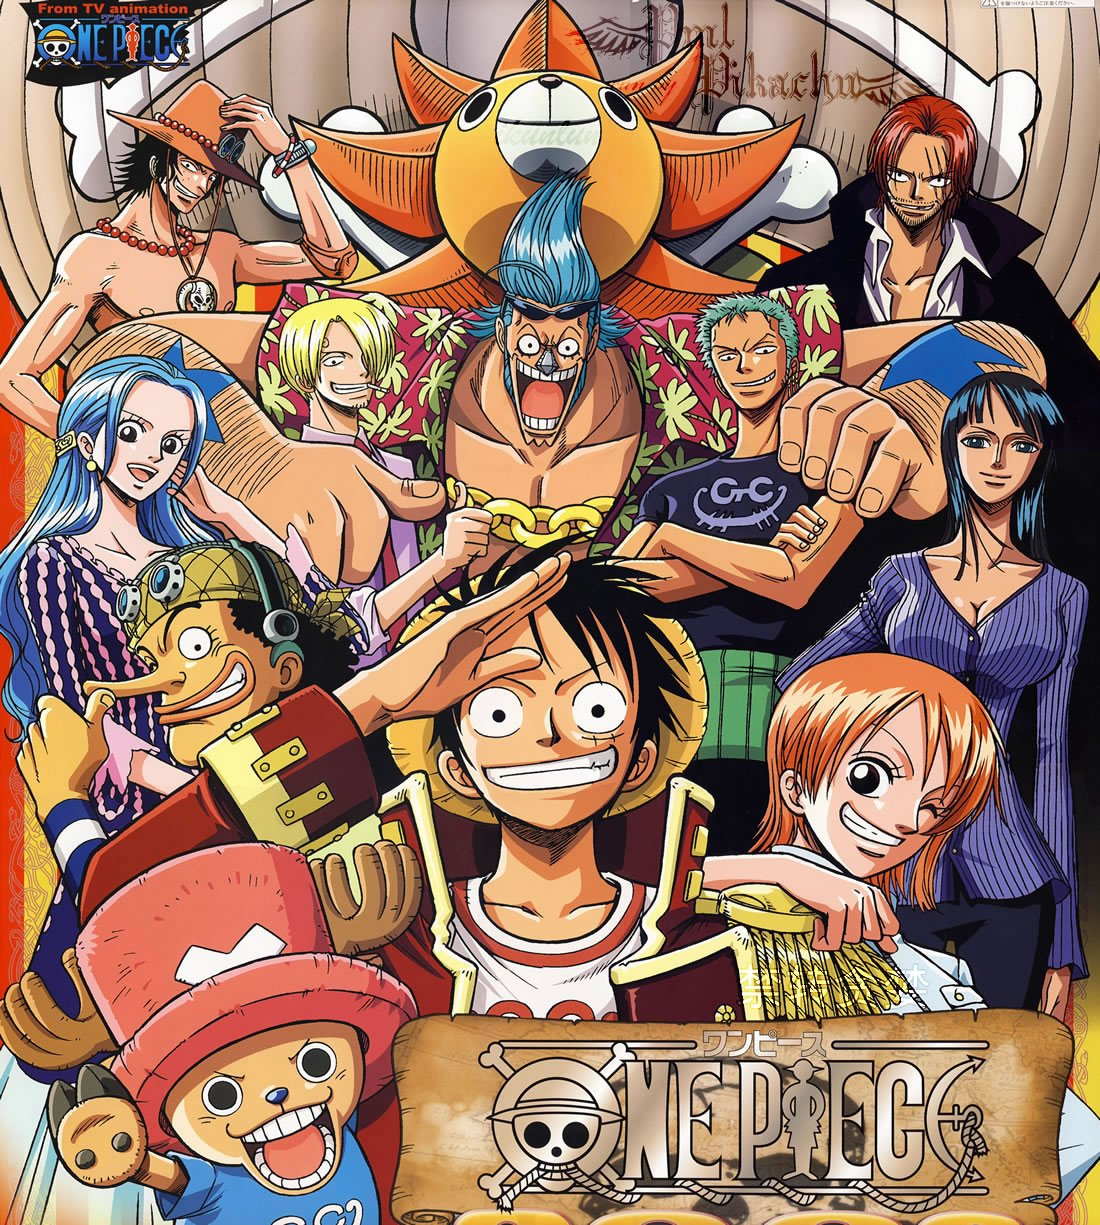 Kumpulan Gambar Kartun Lucu E Piece